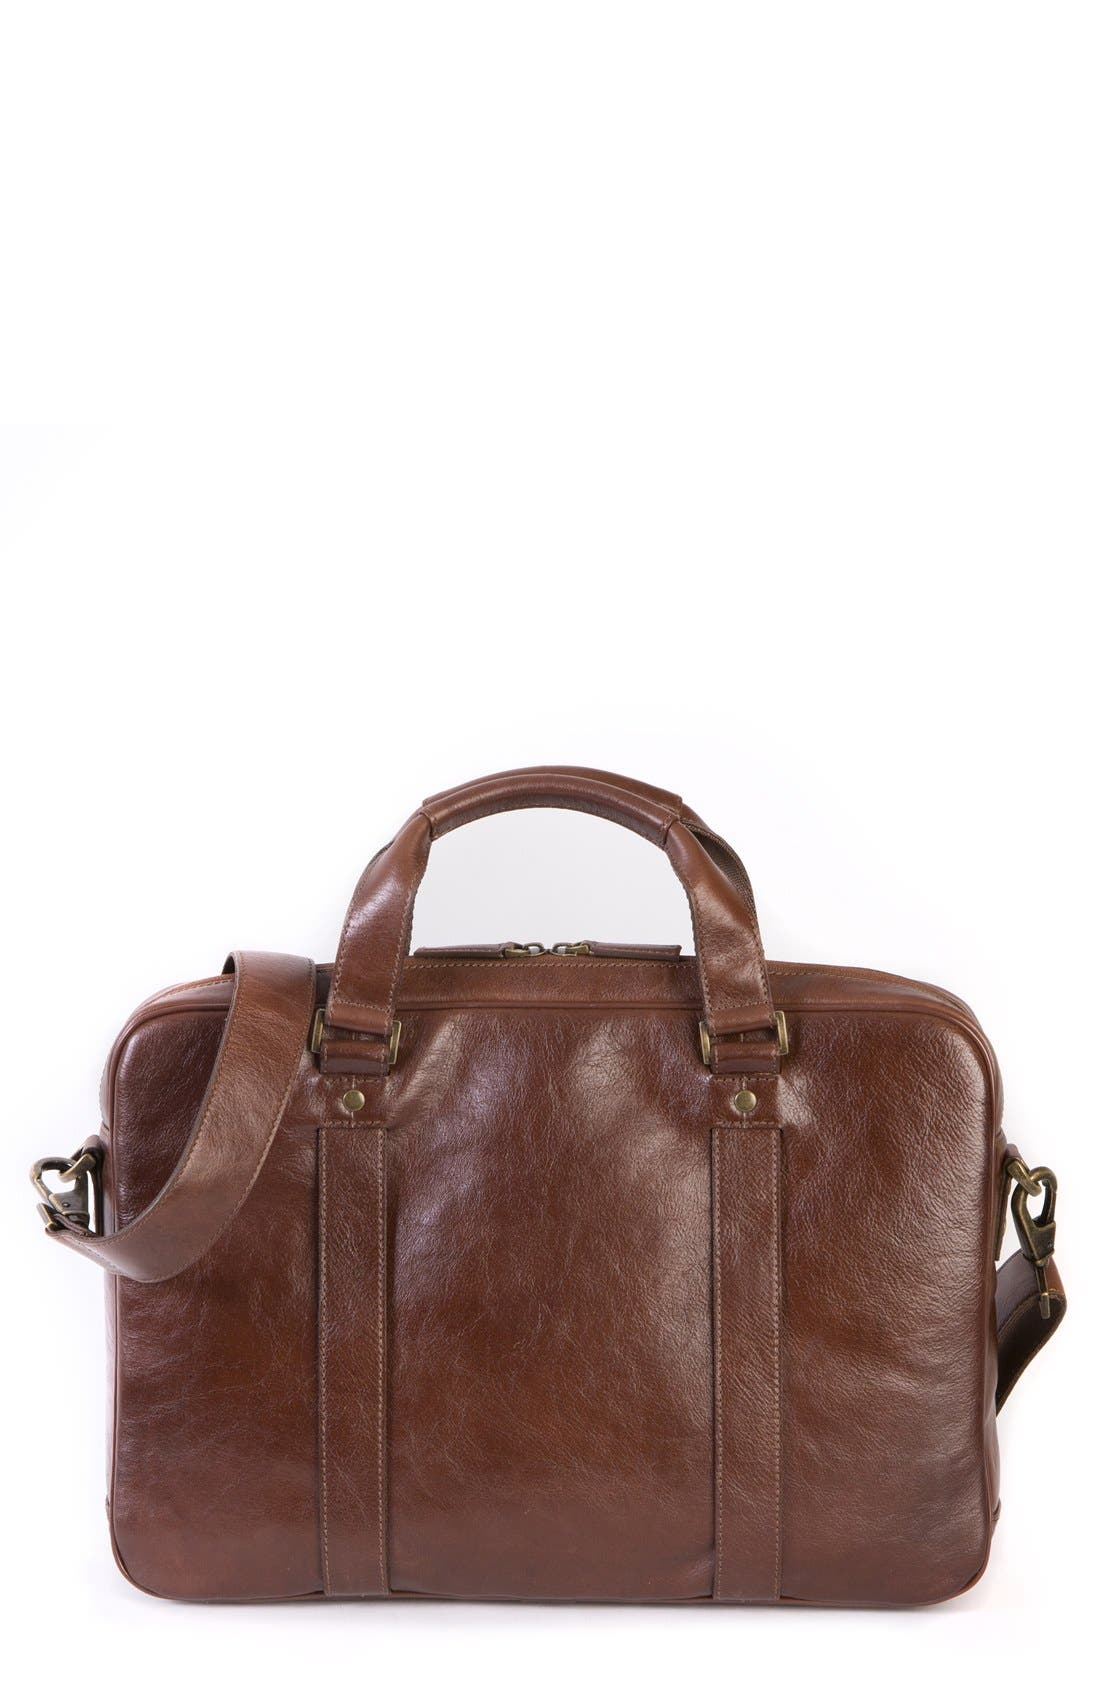 'Becker' Leather Briefcase,                             Main thumbnail 1, color,                             Whiskey W/ Khaki